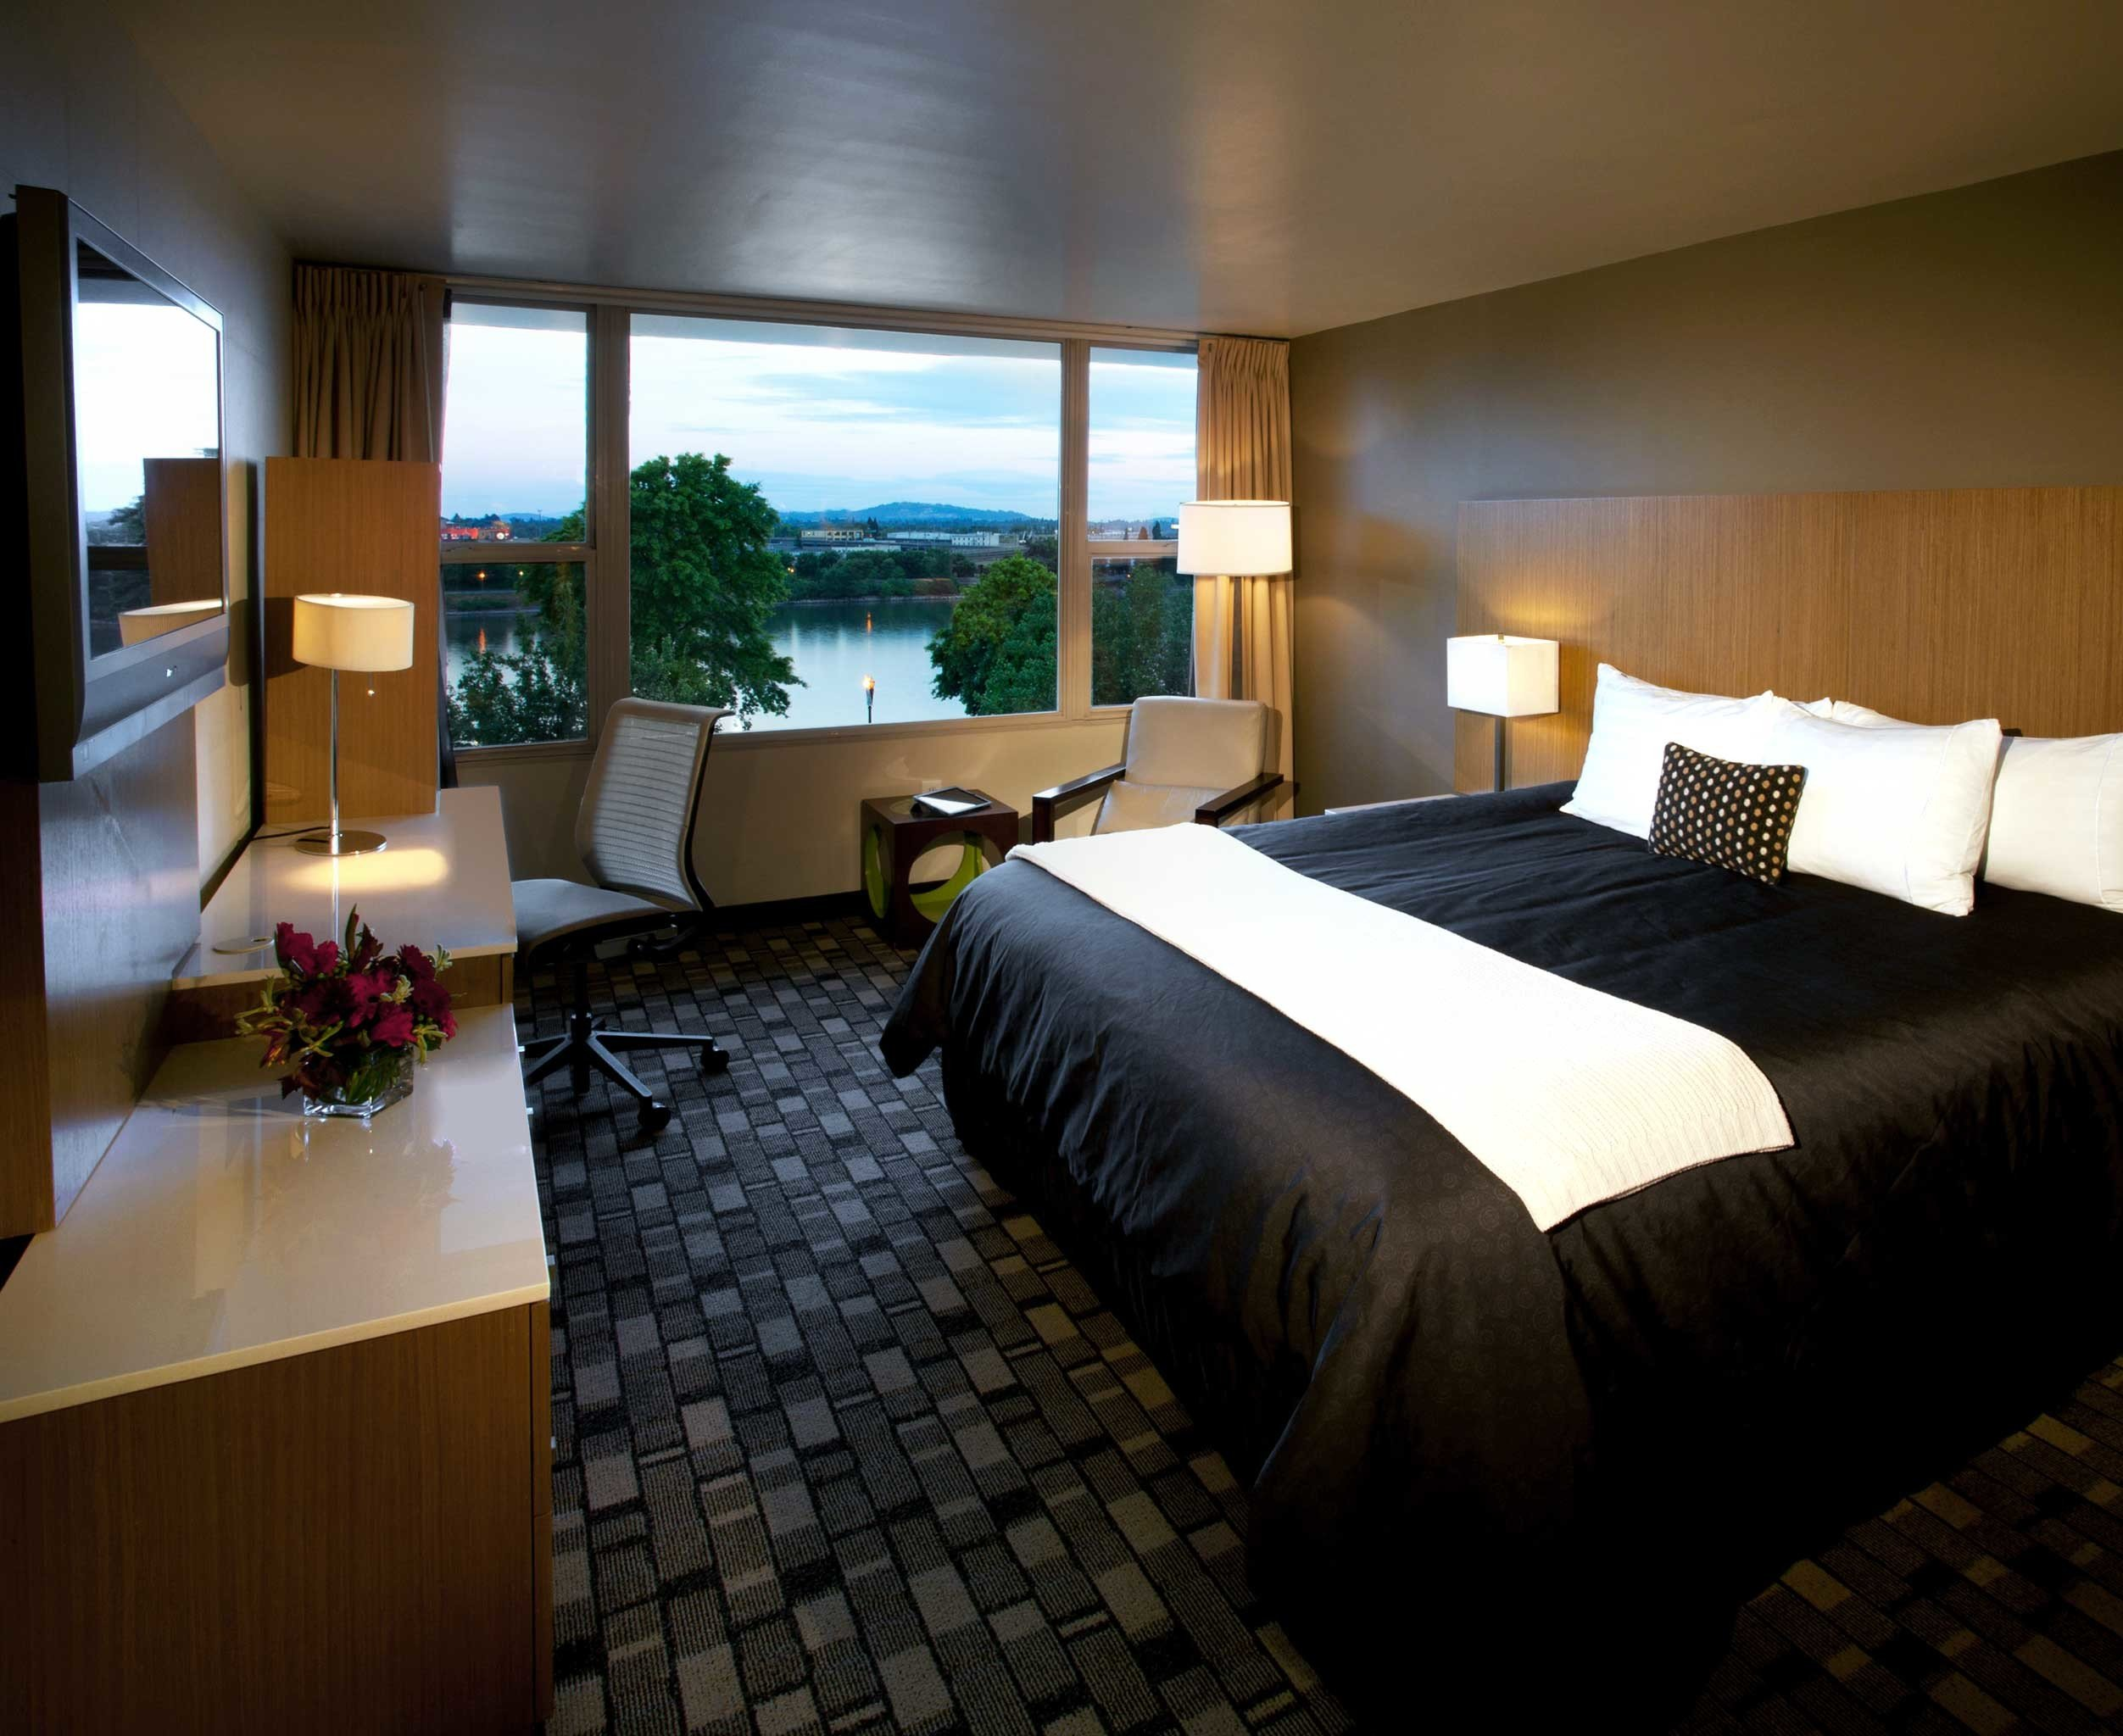 Bedroom Modern Scenic views sofa property Suite condominium Villa cottage lamp